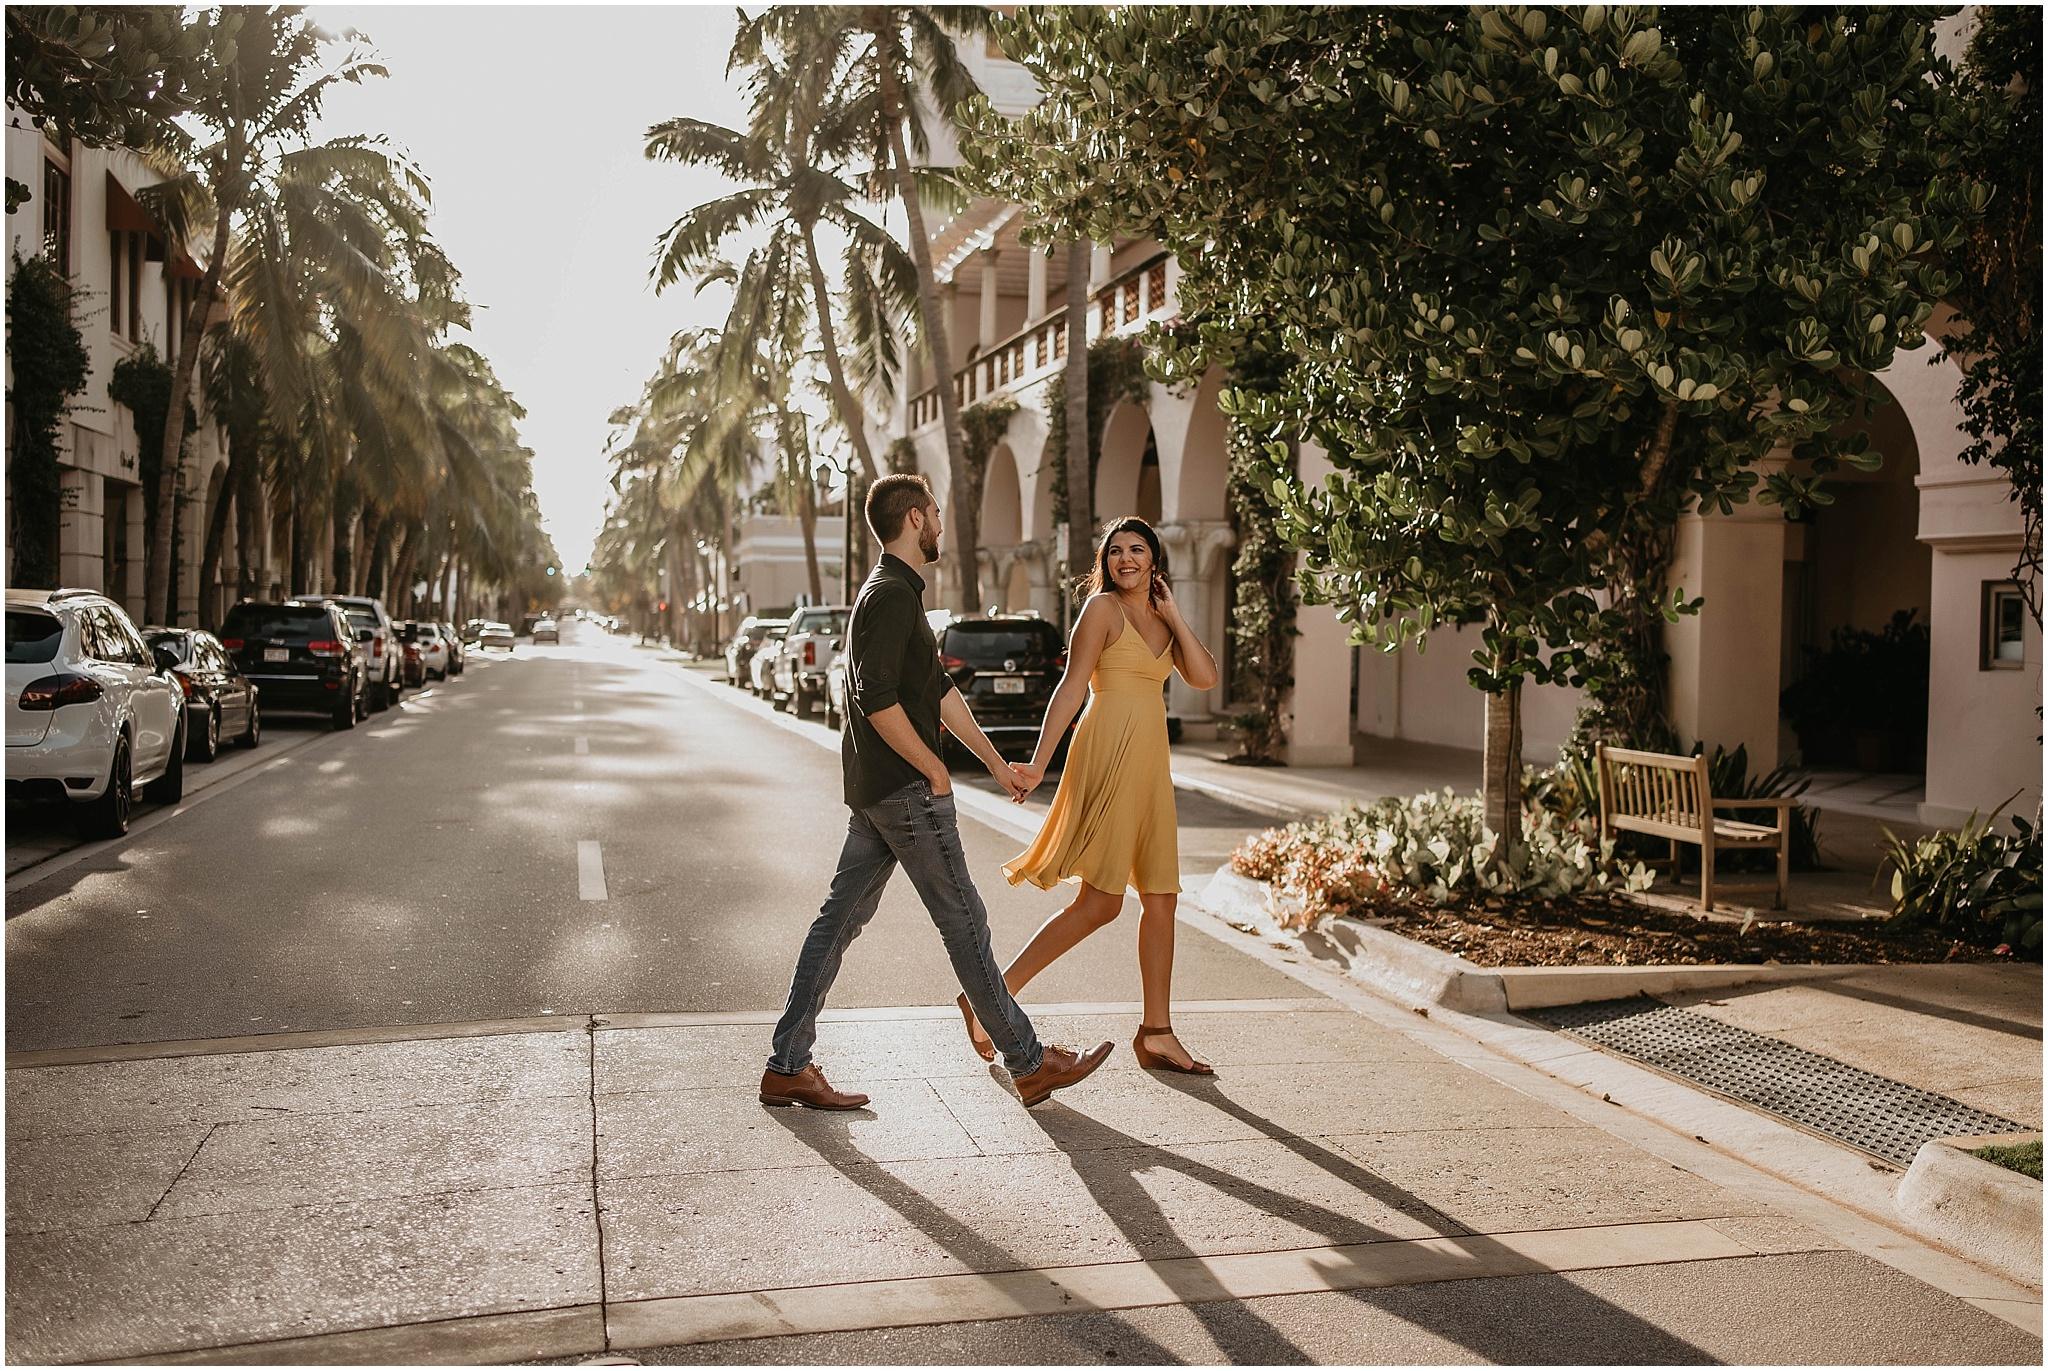 Worth-Avenue-Palm-Beach-engagement-photographer_0004.jpg